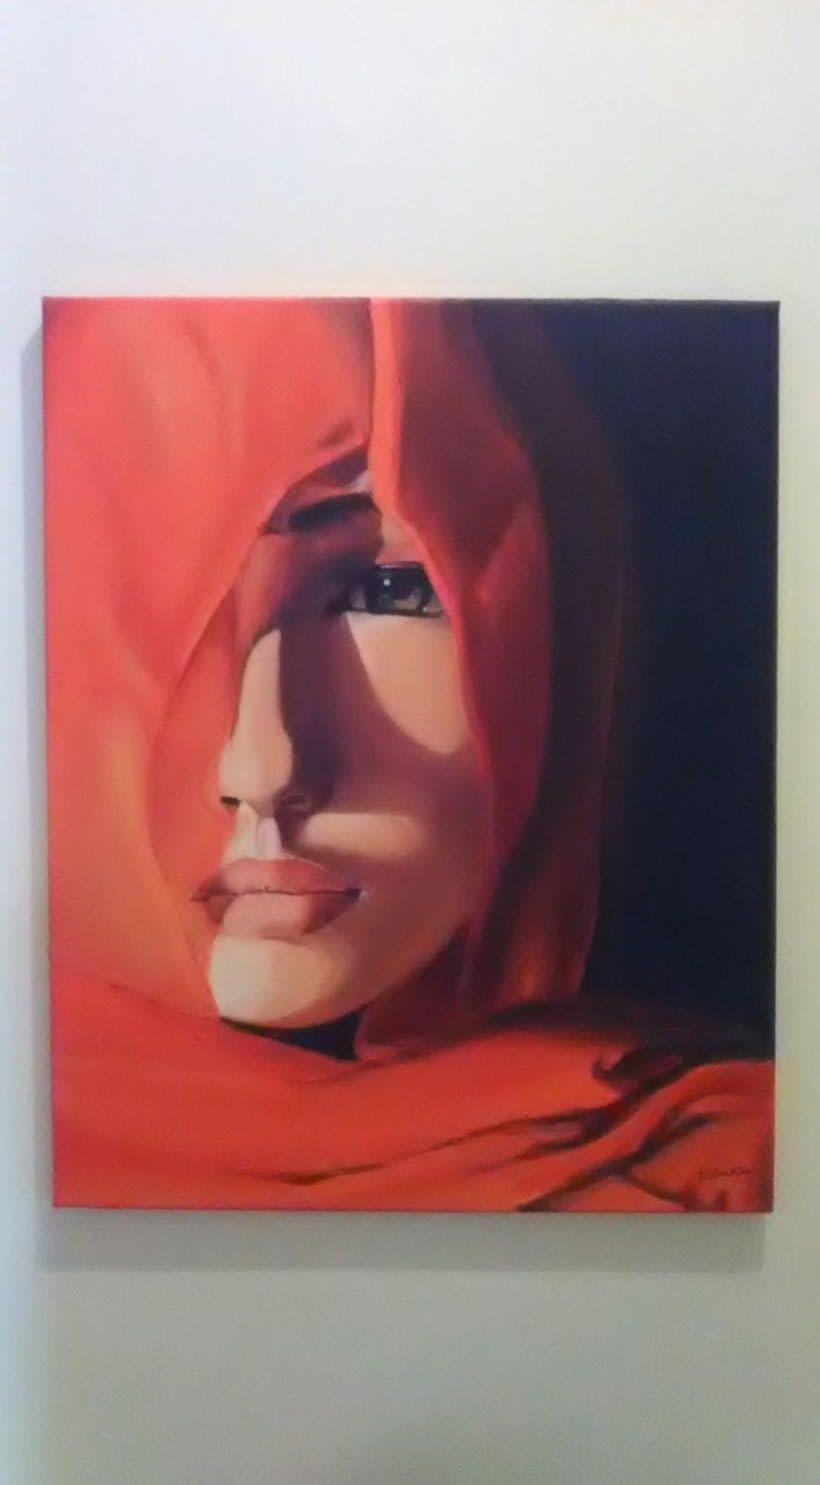 Pintura / Painting 2